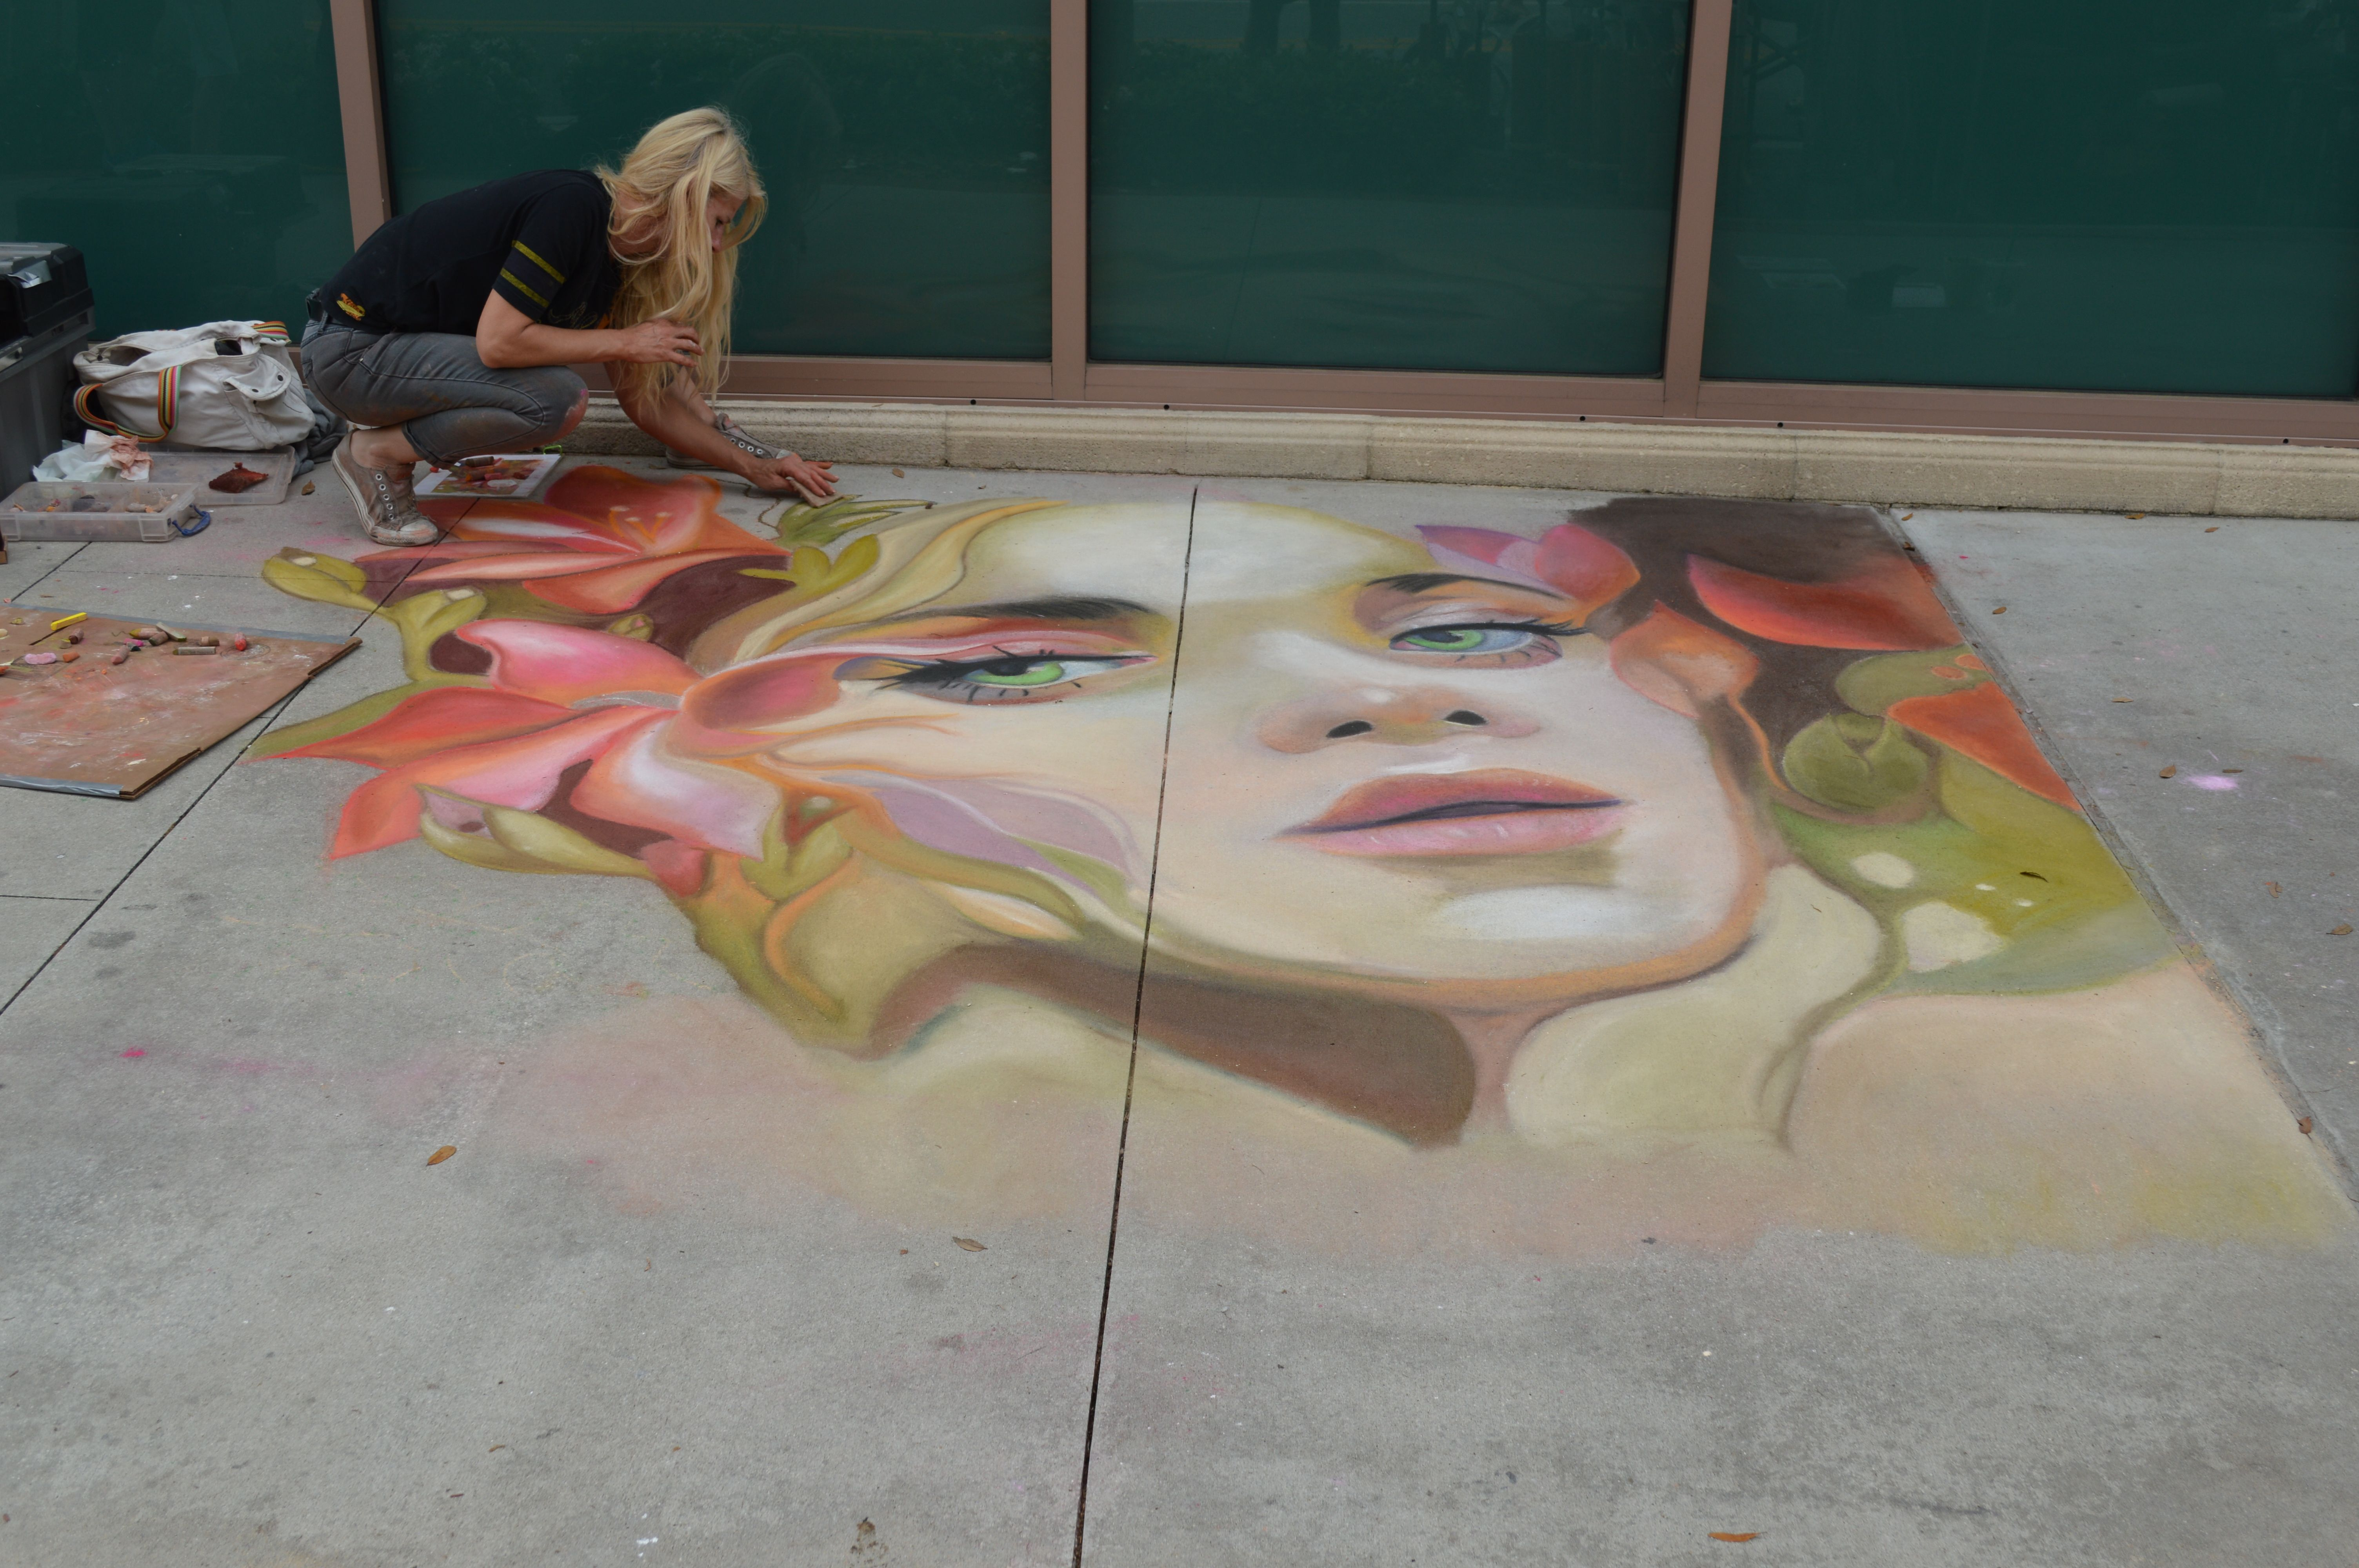 Annual Safety Harbor Chalk art festival 2 Chalk art